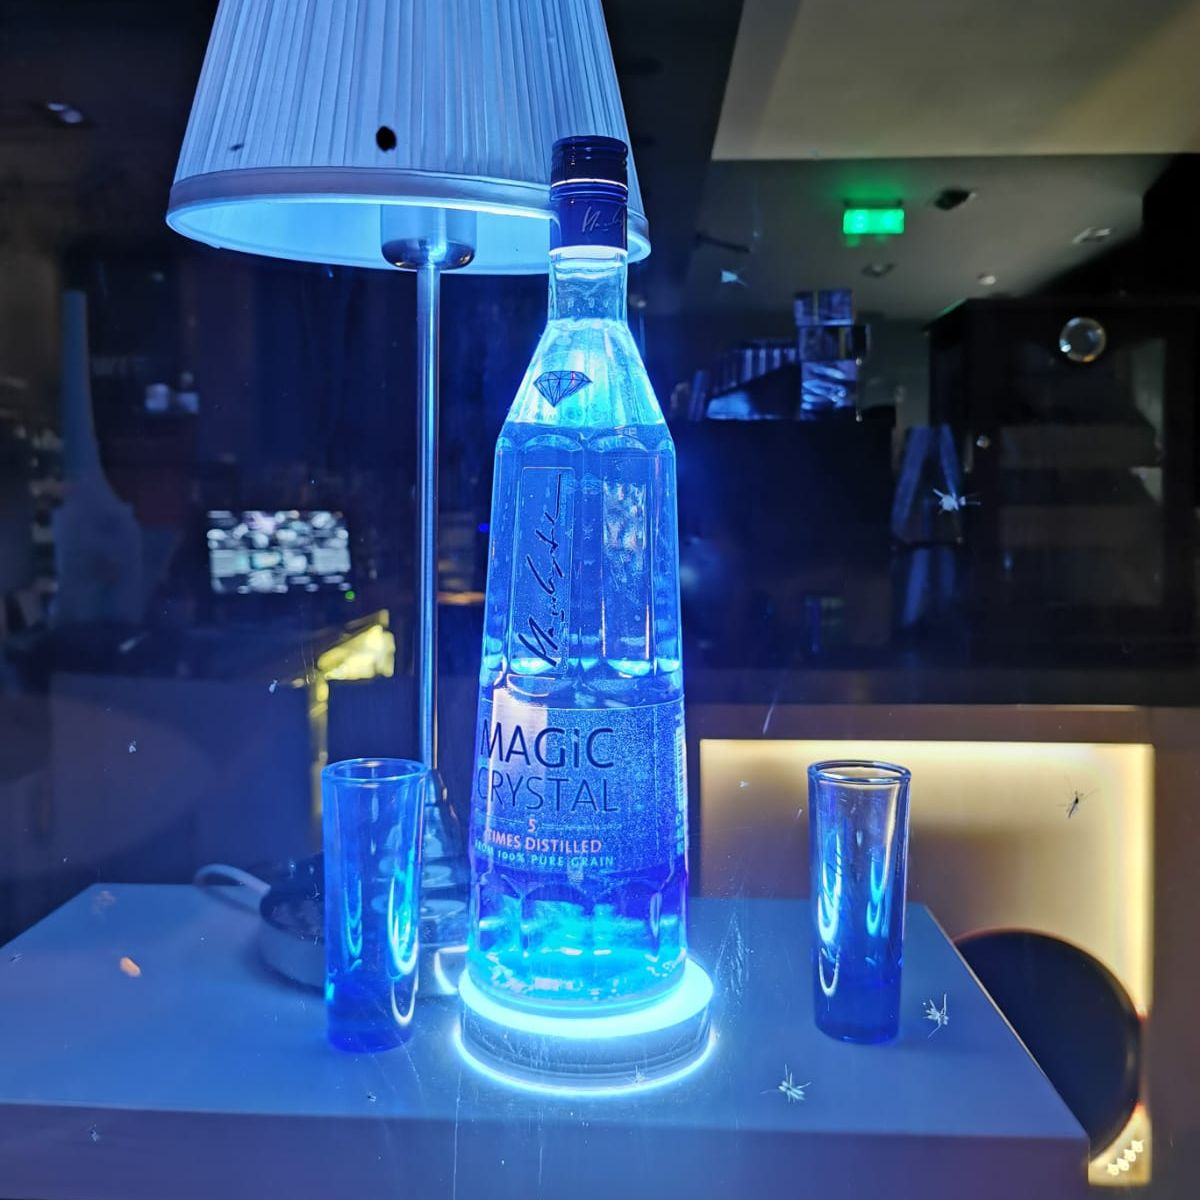 Iluminare sticla bautura - front